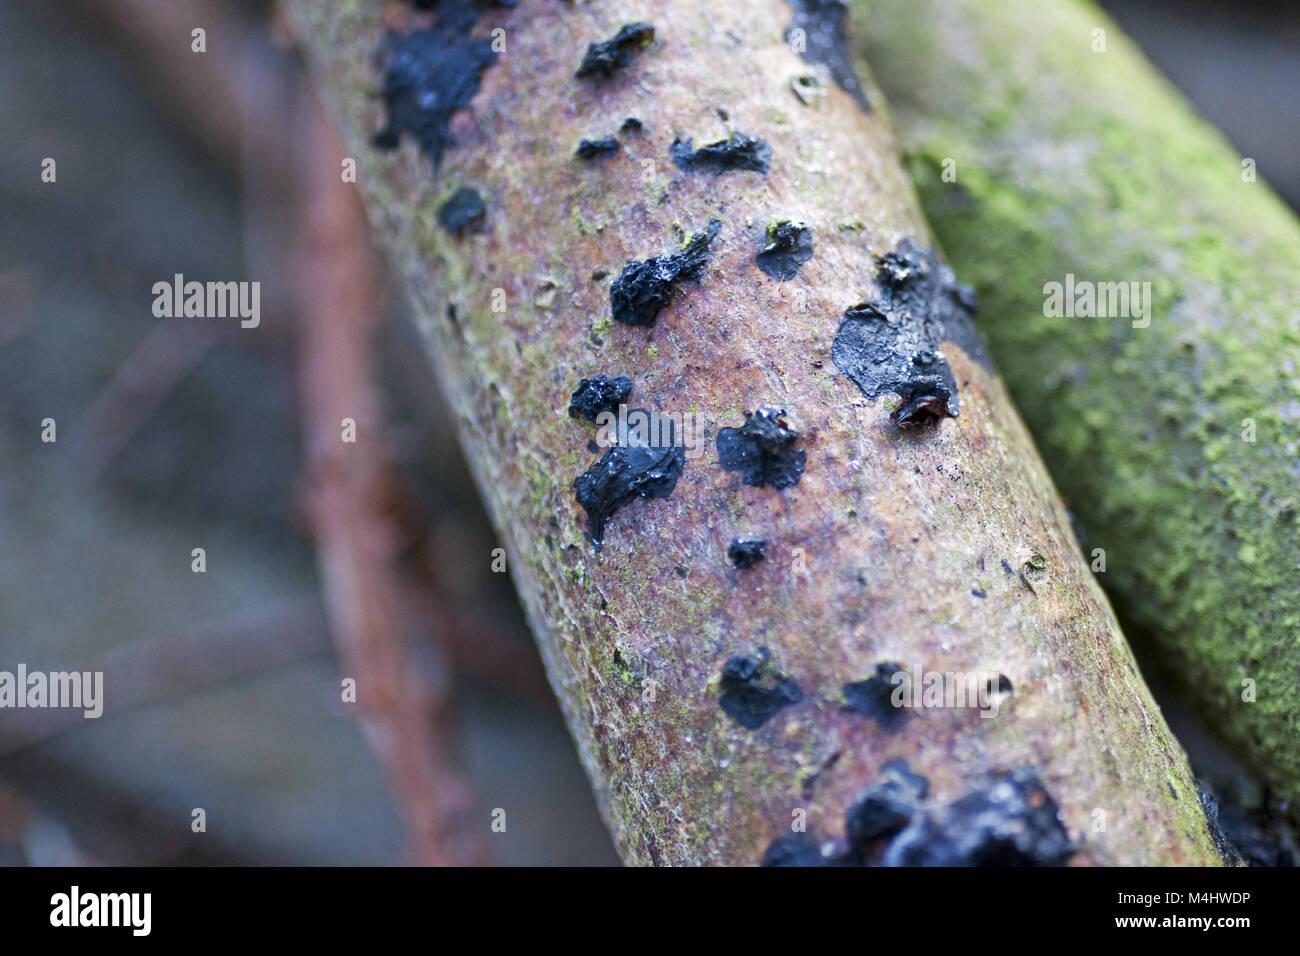 Black brain fungus (Exidia glandulosa) - Stock Image